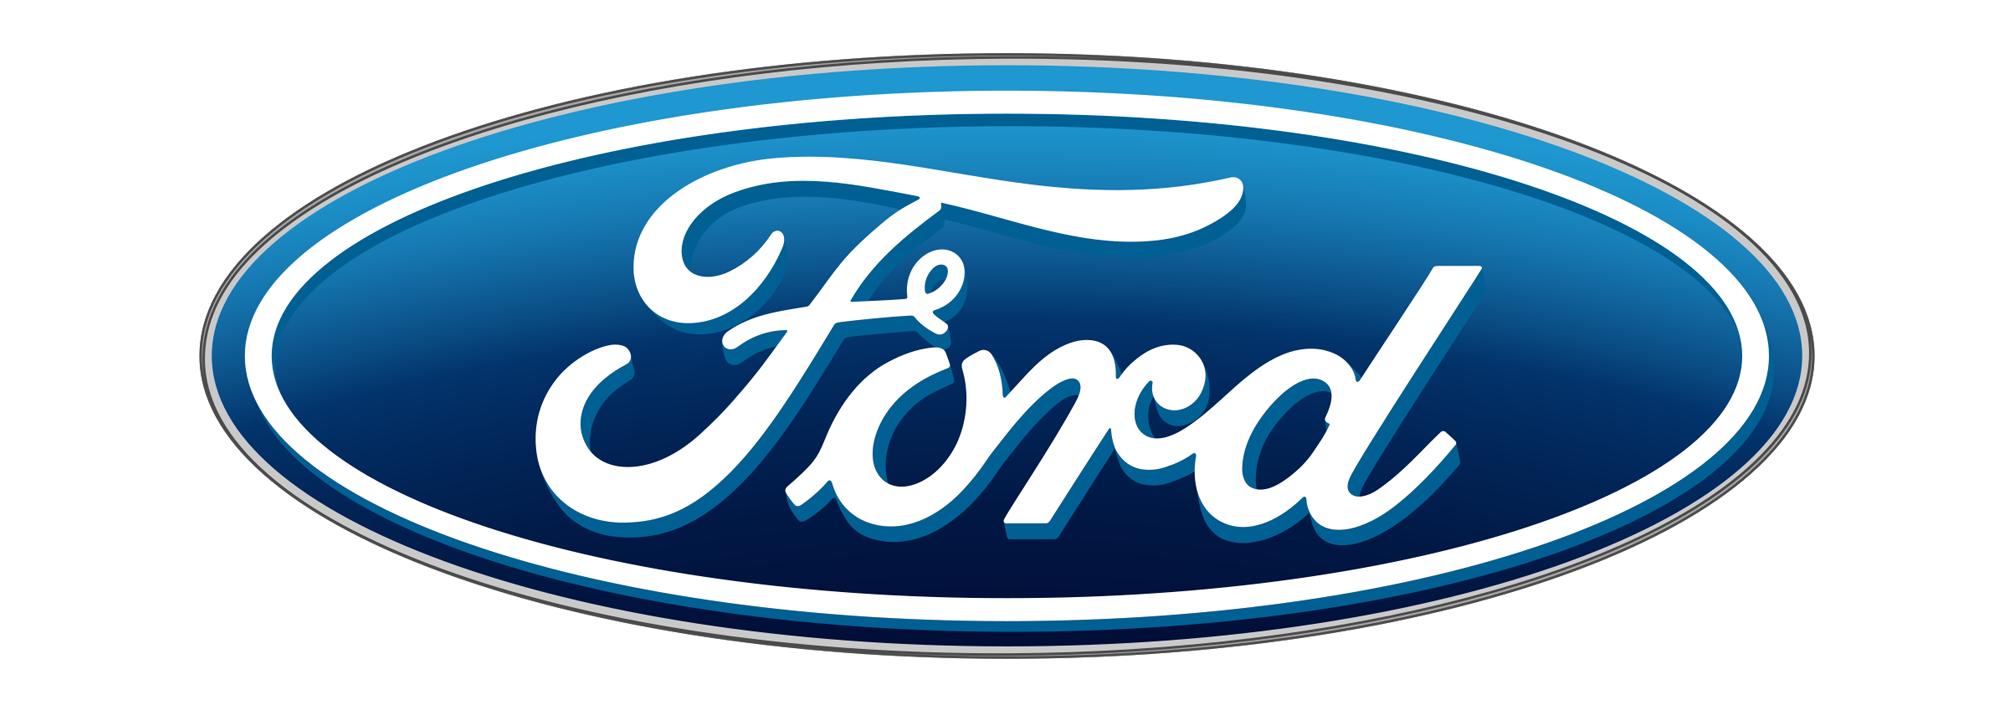 Reparatie Ford Elspeet Nunspeet Putten